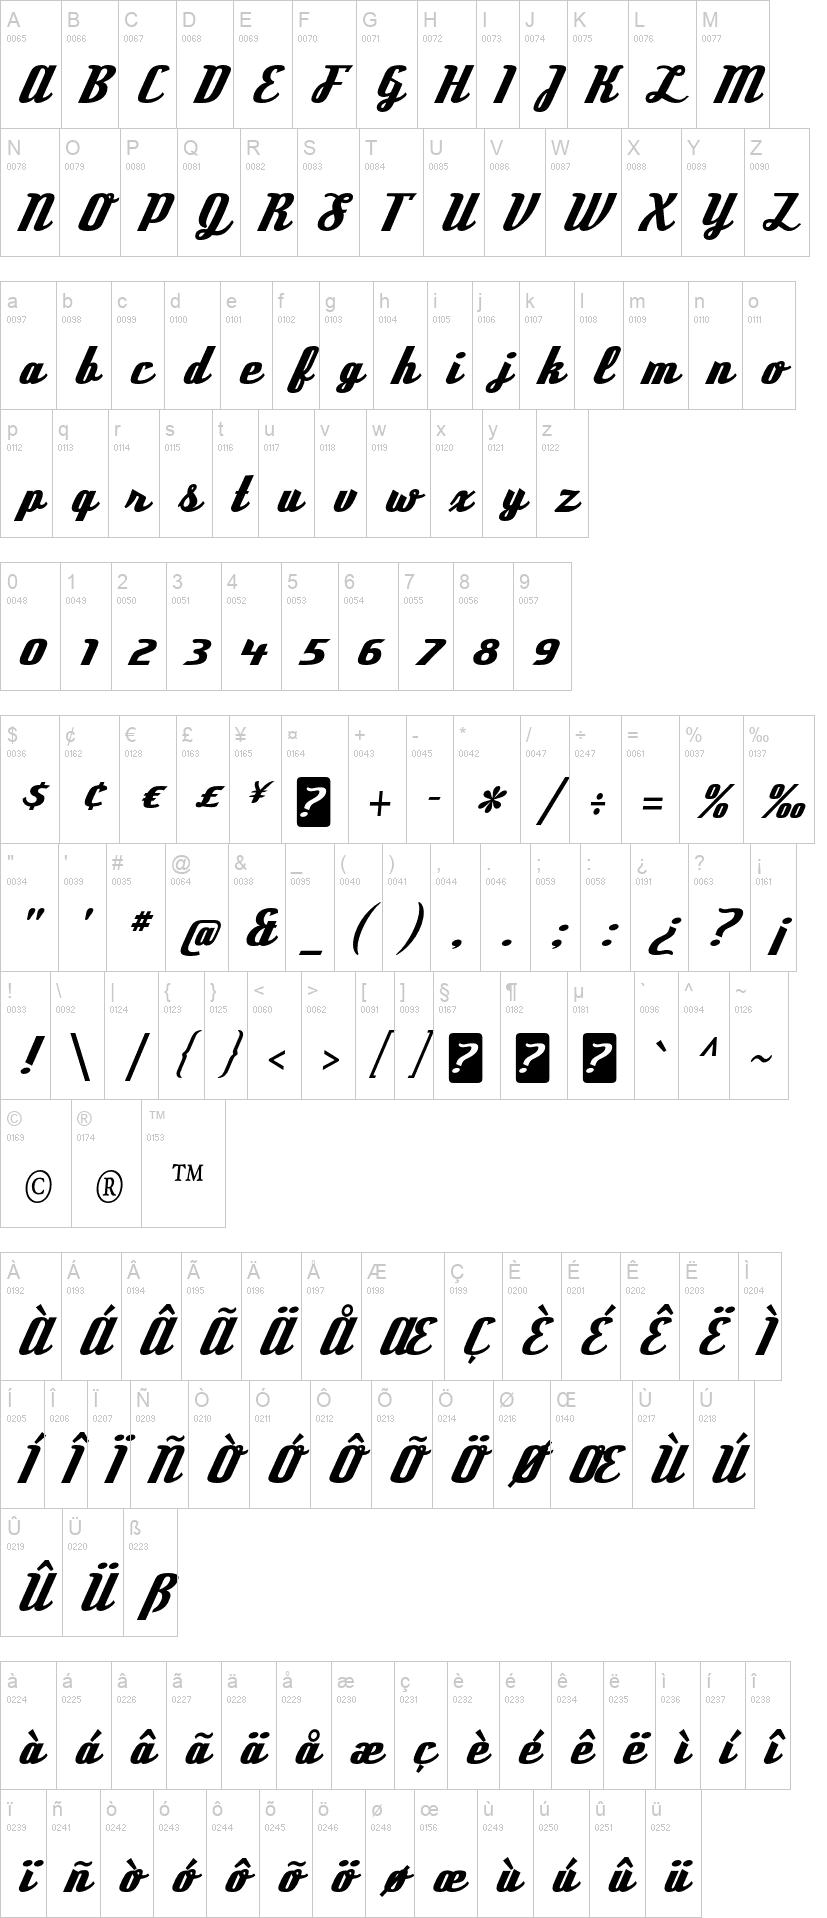 Deftone stylus 1. 00 fonts free download onlinewebfonts. Com.